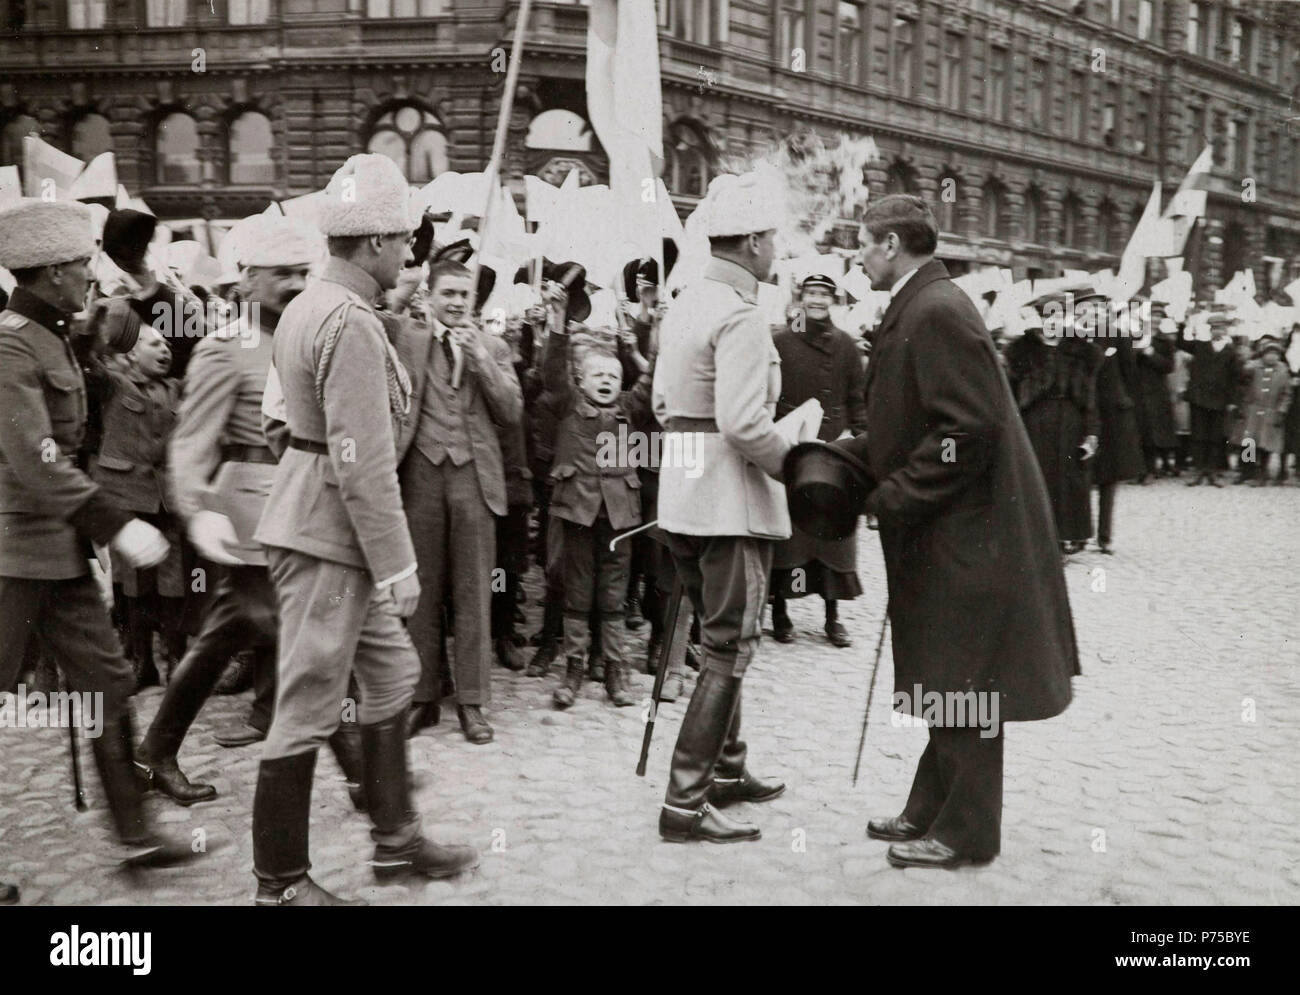 Picture of ceremonial parade. 1919 Carl Gusaf Mannerheim - Stock Image